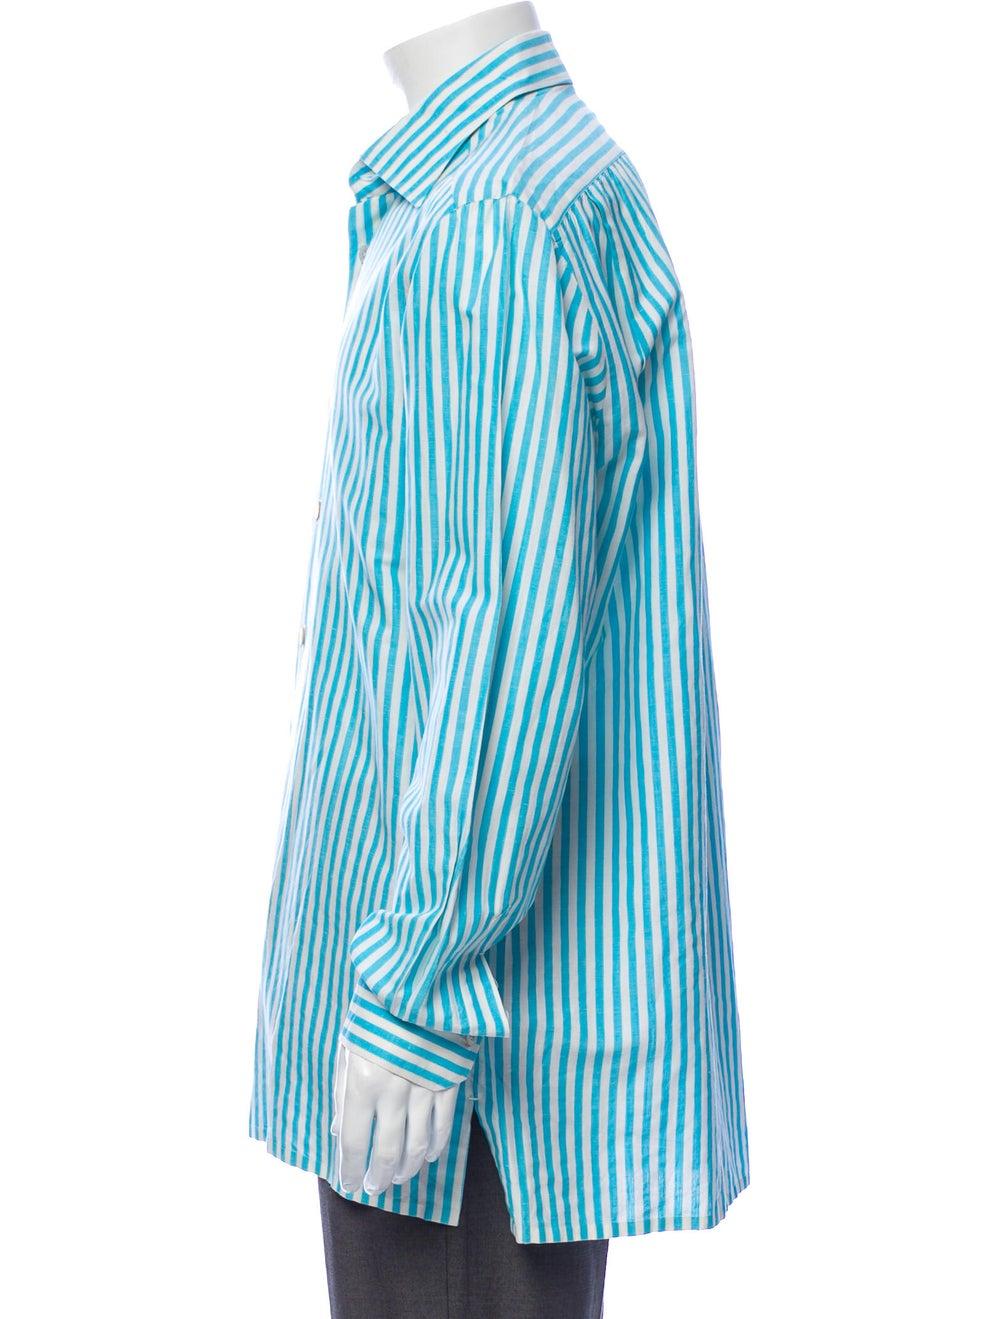 Kiton Linen Striped Shirt Blue - image 2